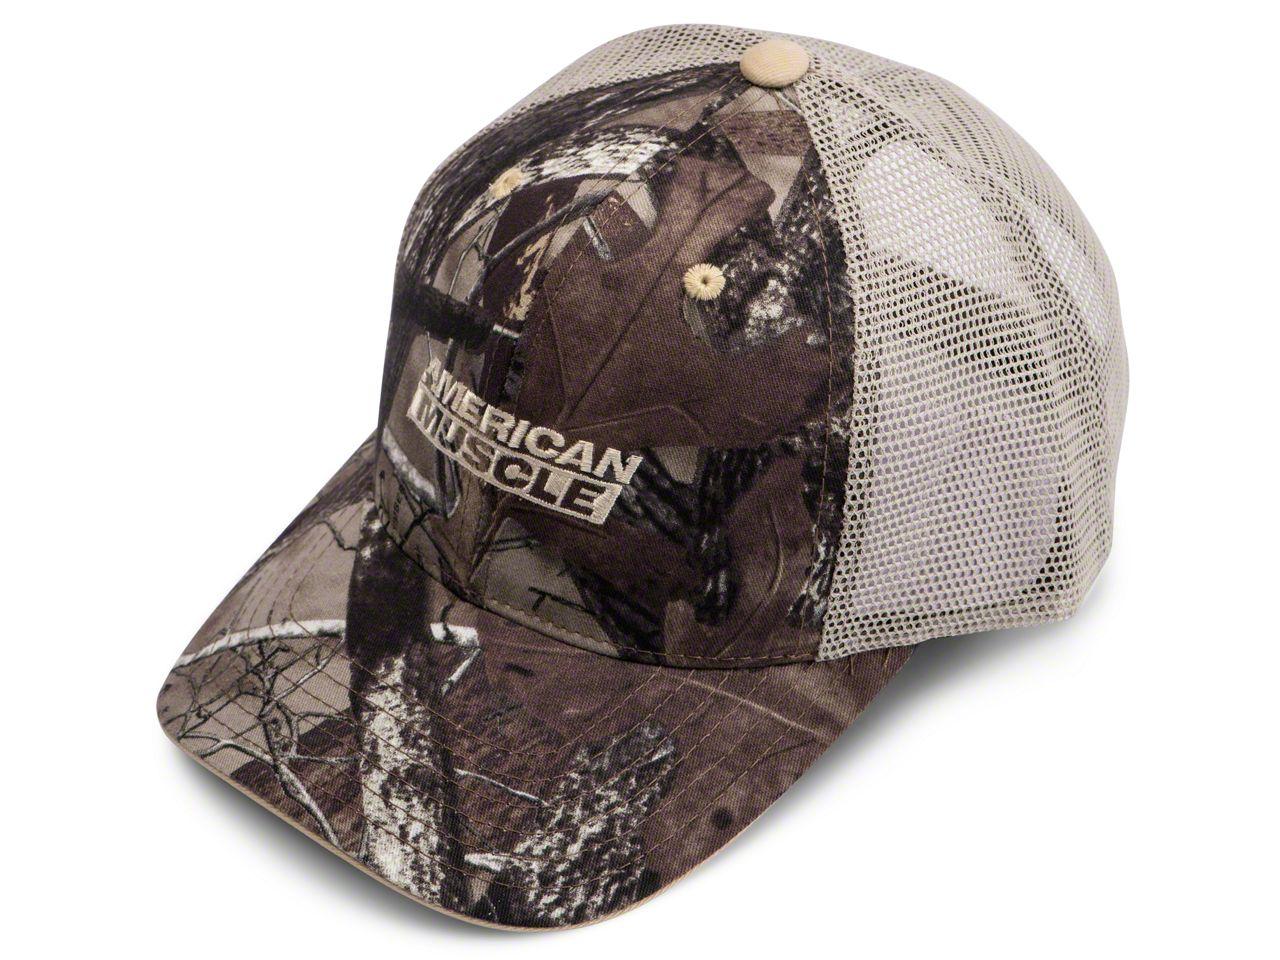 AmericanMuscle Camo Mesh Hat